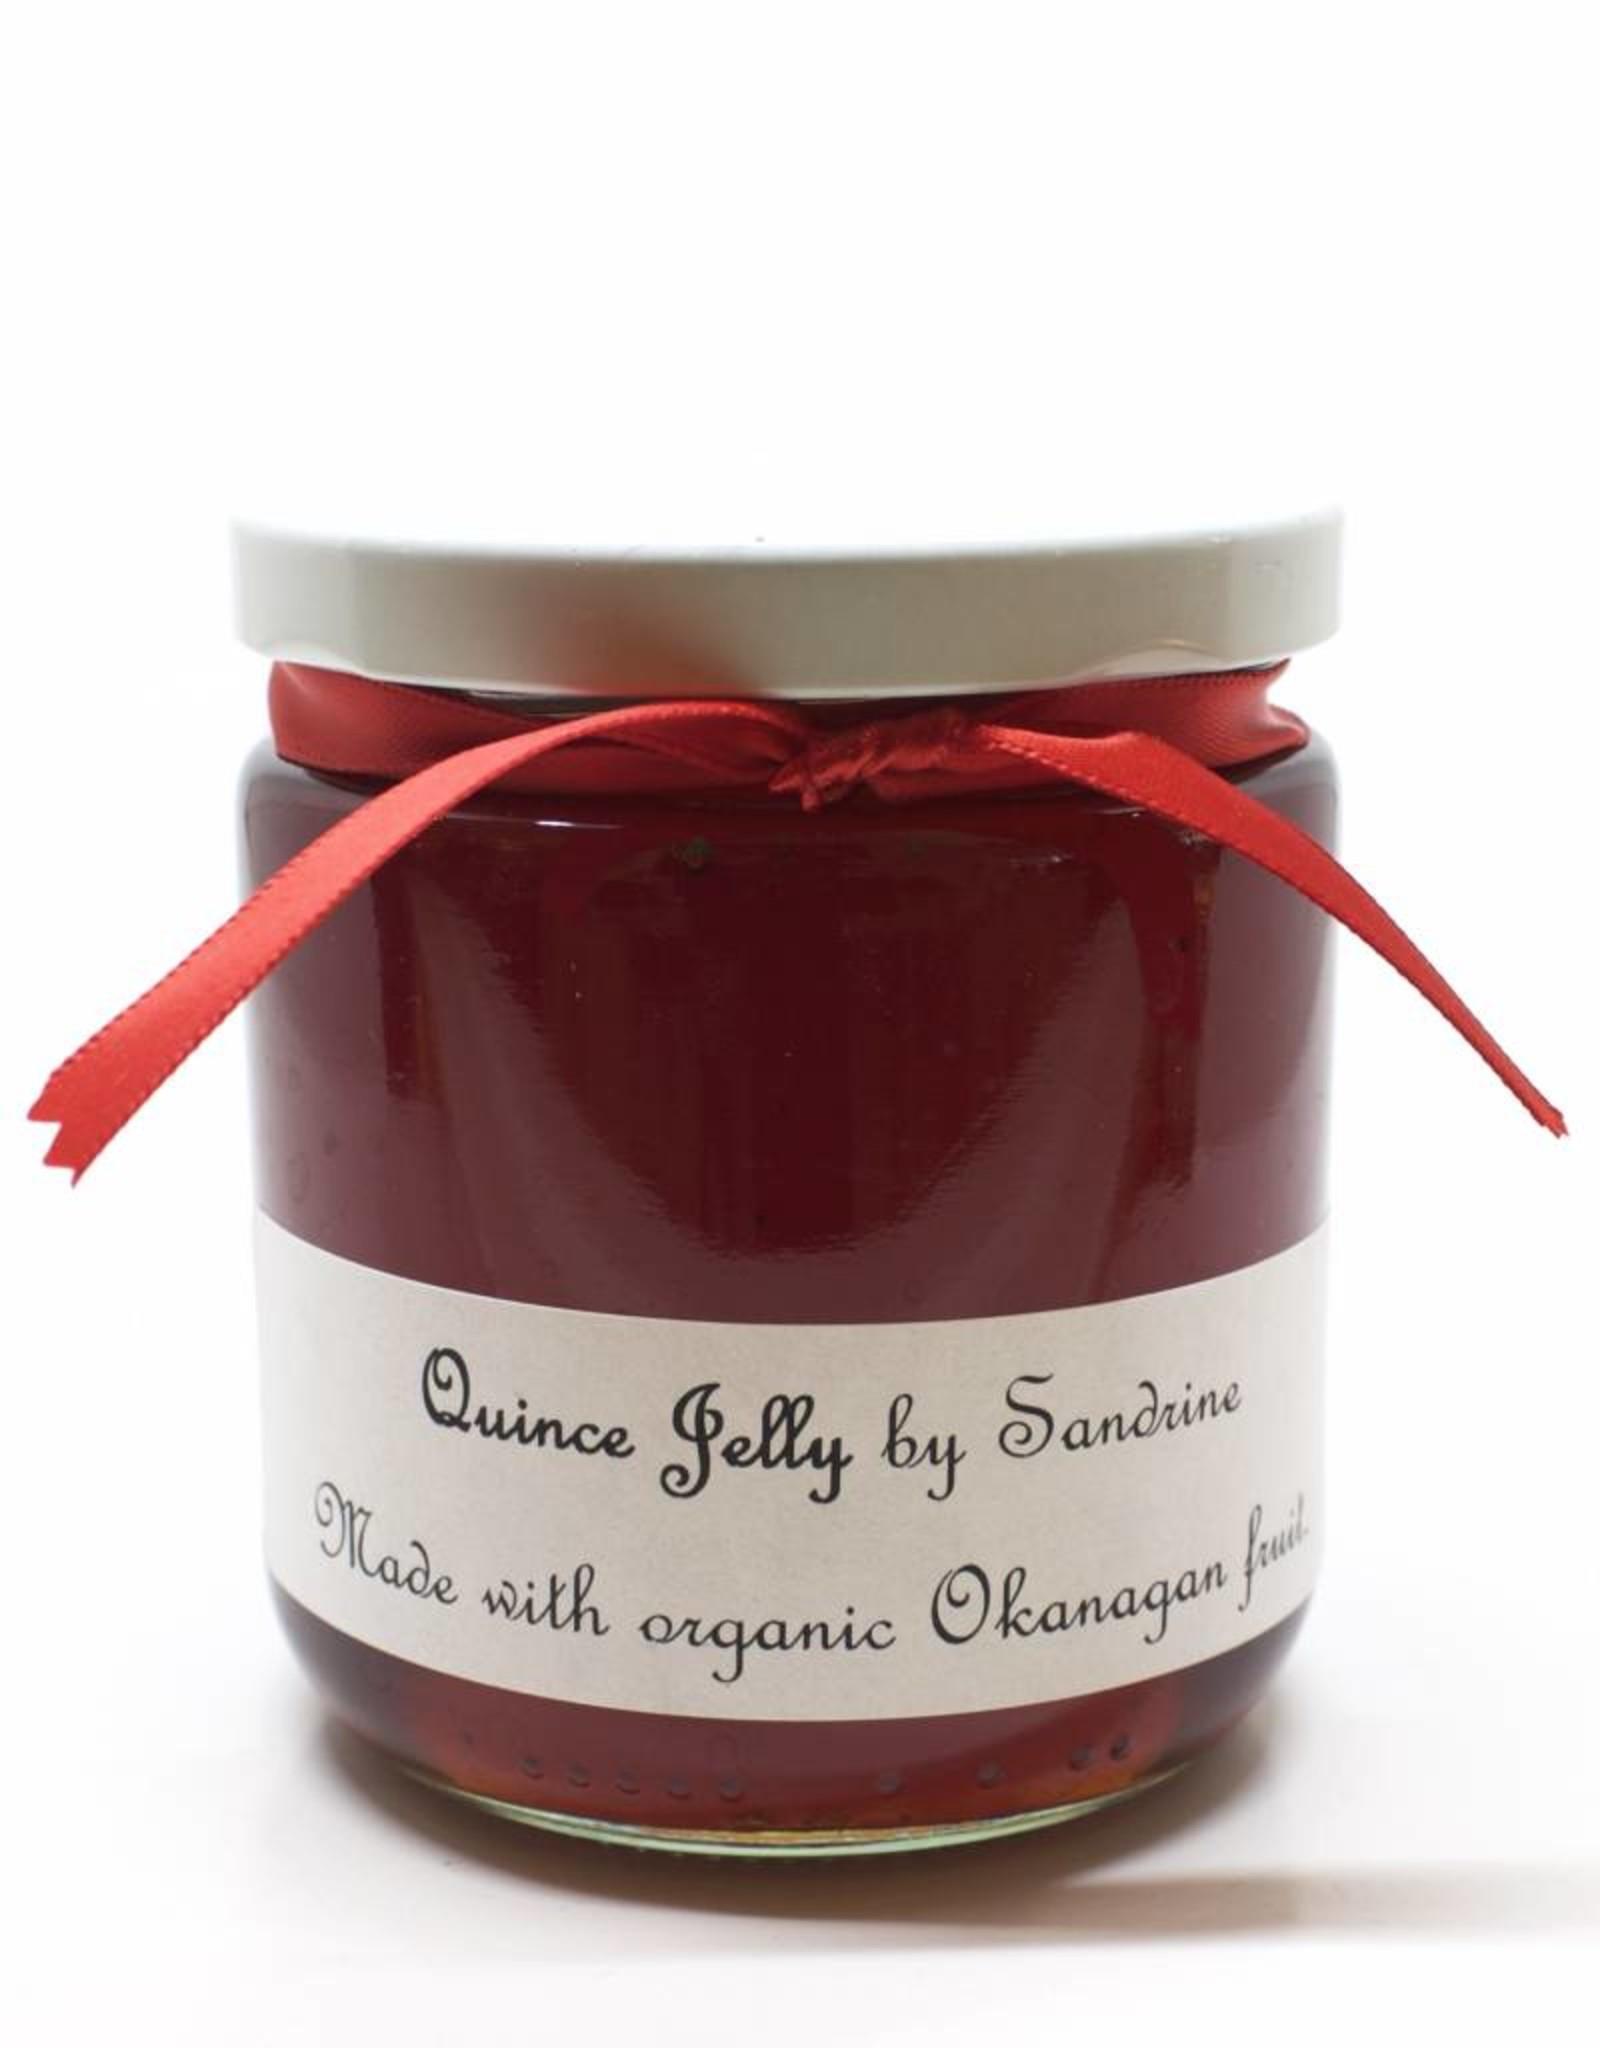 Sandrine Quince Jelly